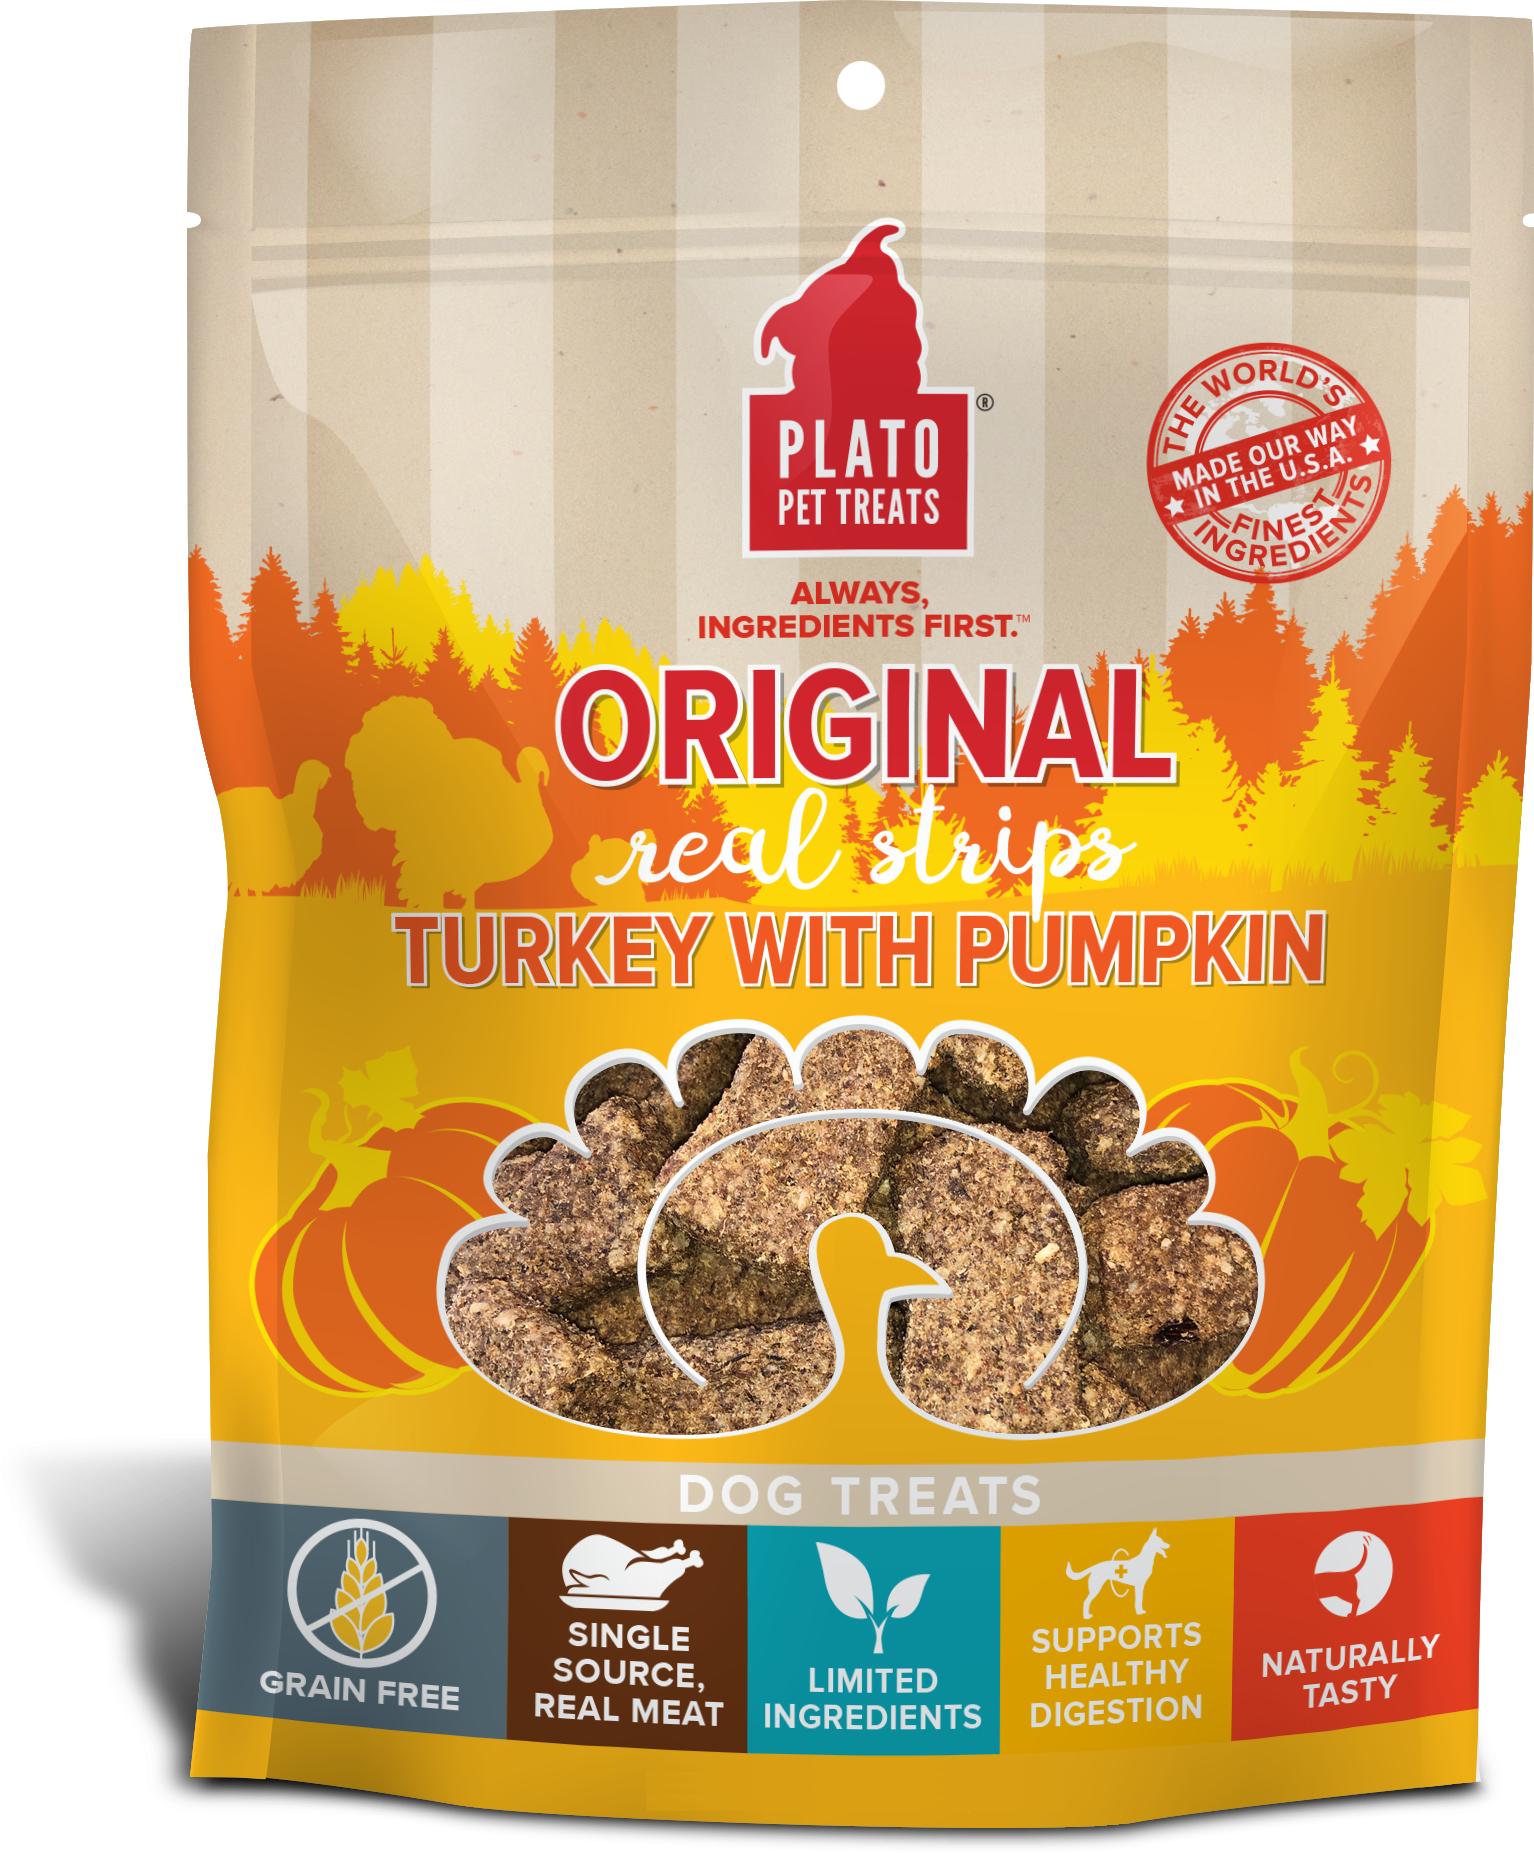 Plato Original Real Strips Turkey With Pumpkin Potato Dog Treat, 18-oz Size: 18-oz